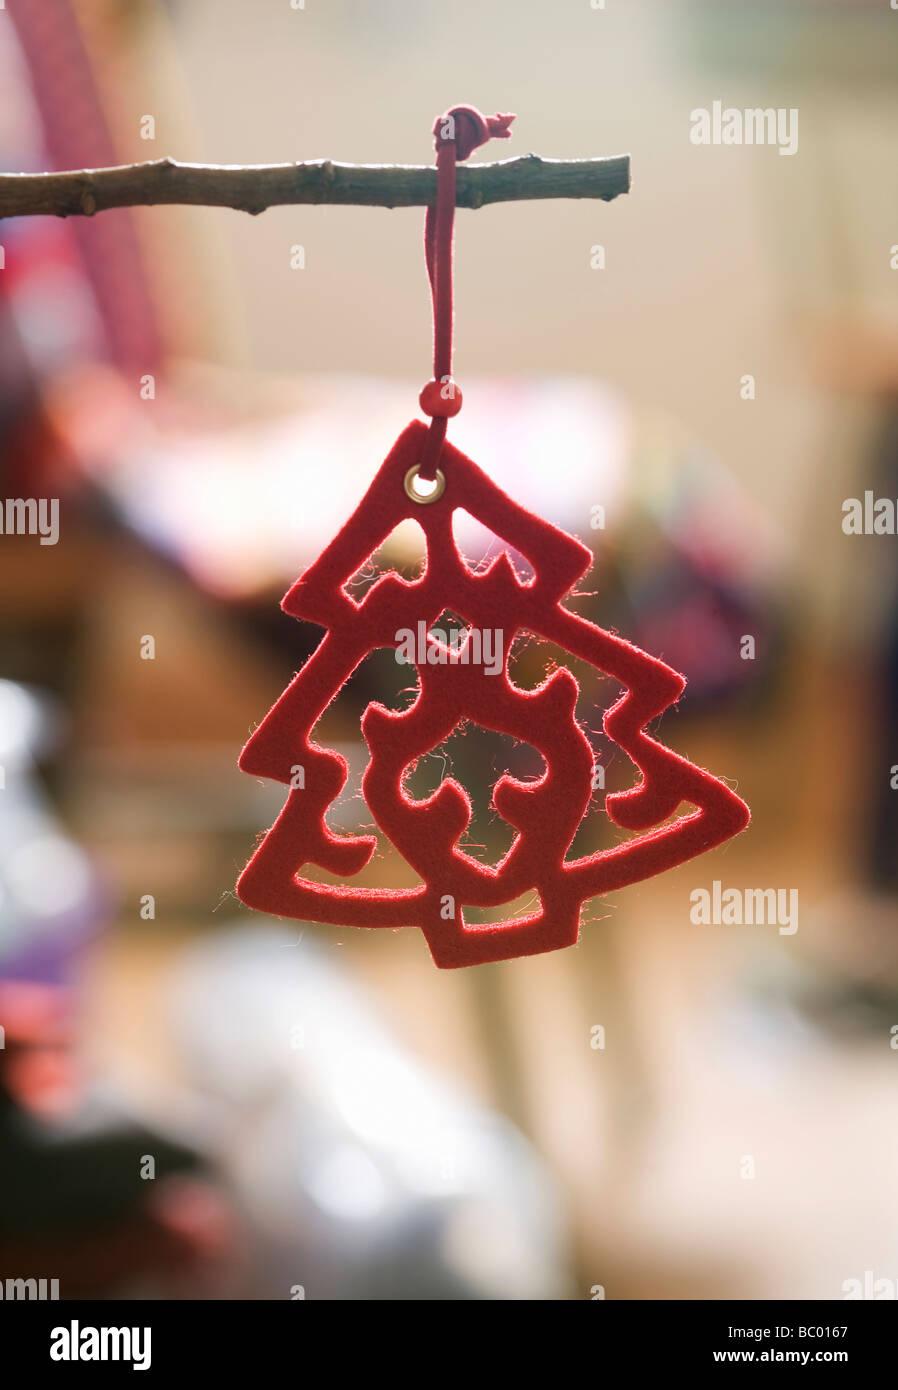 Red Christmas tree decoration - Stock Image